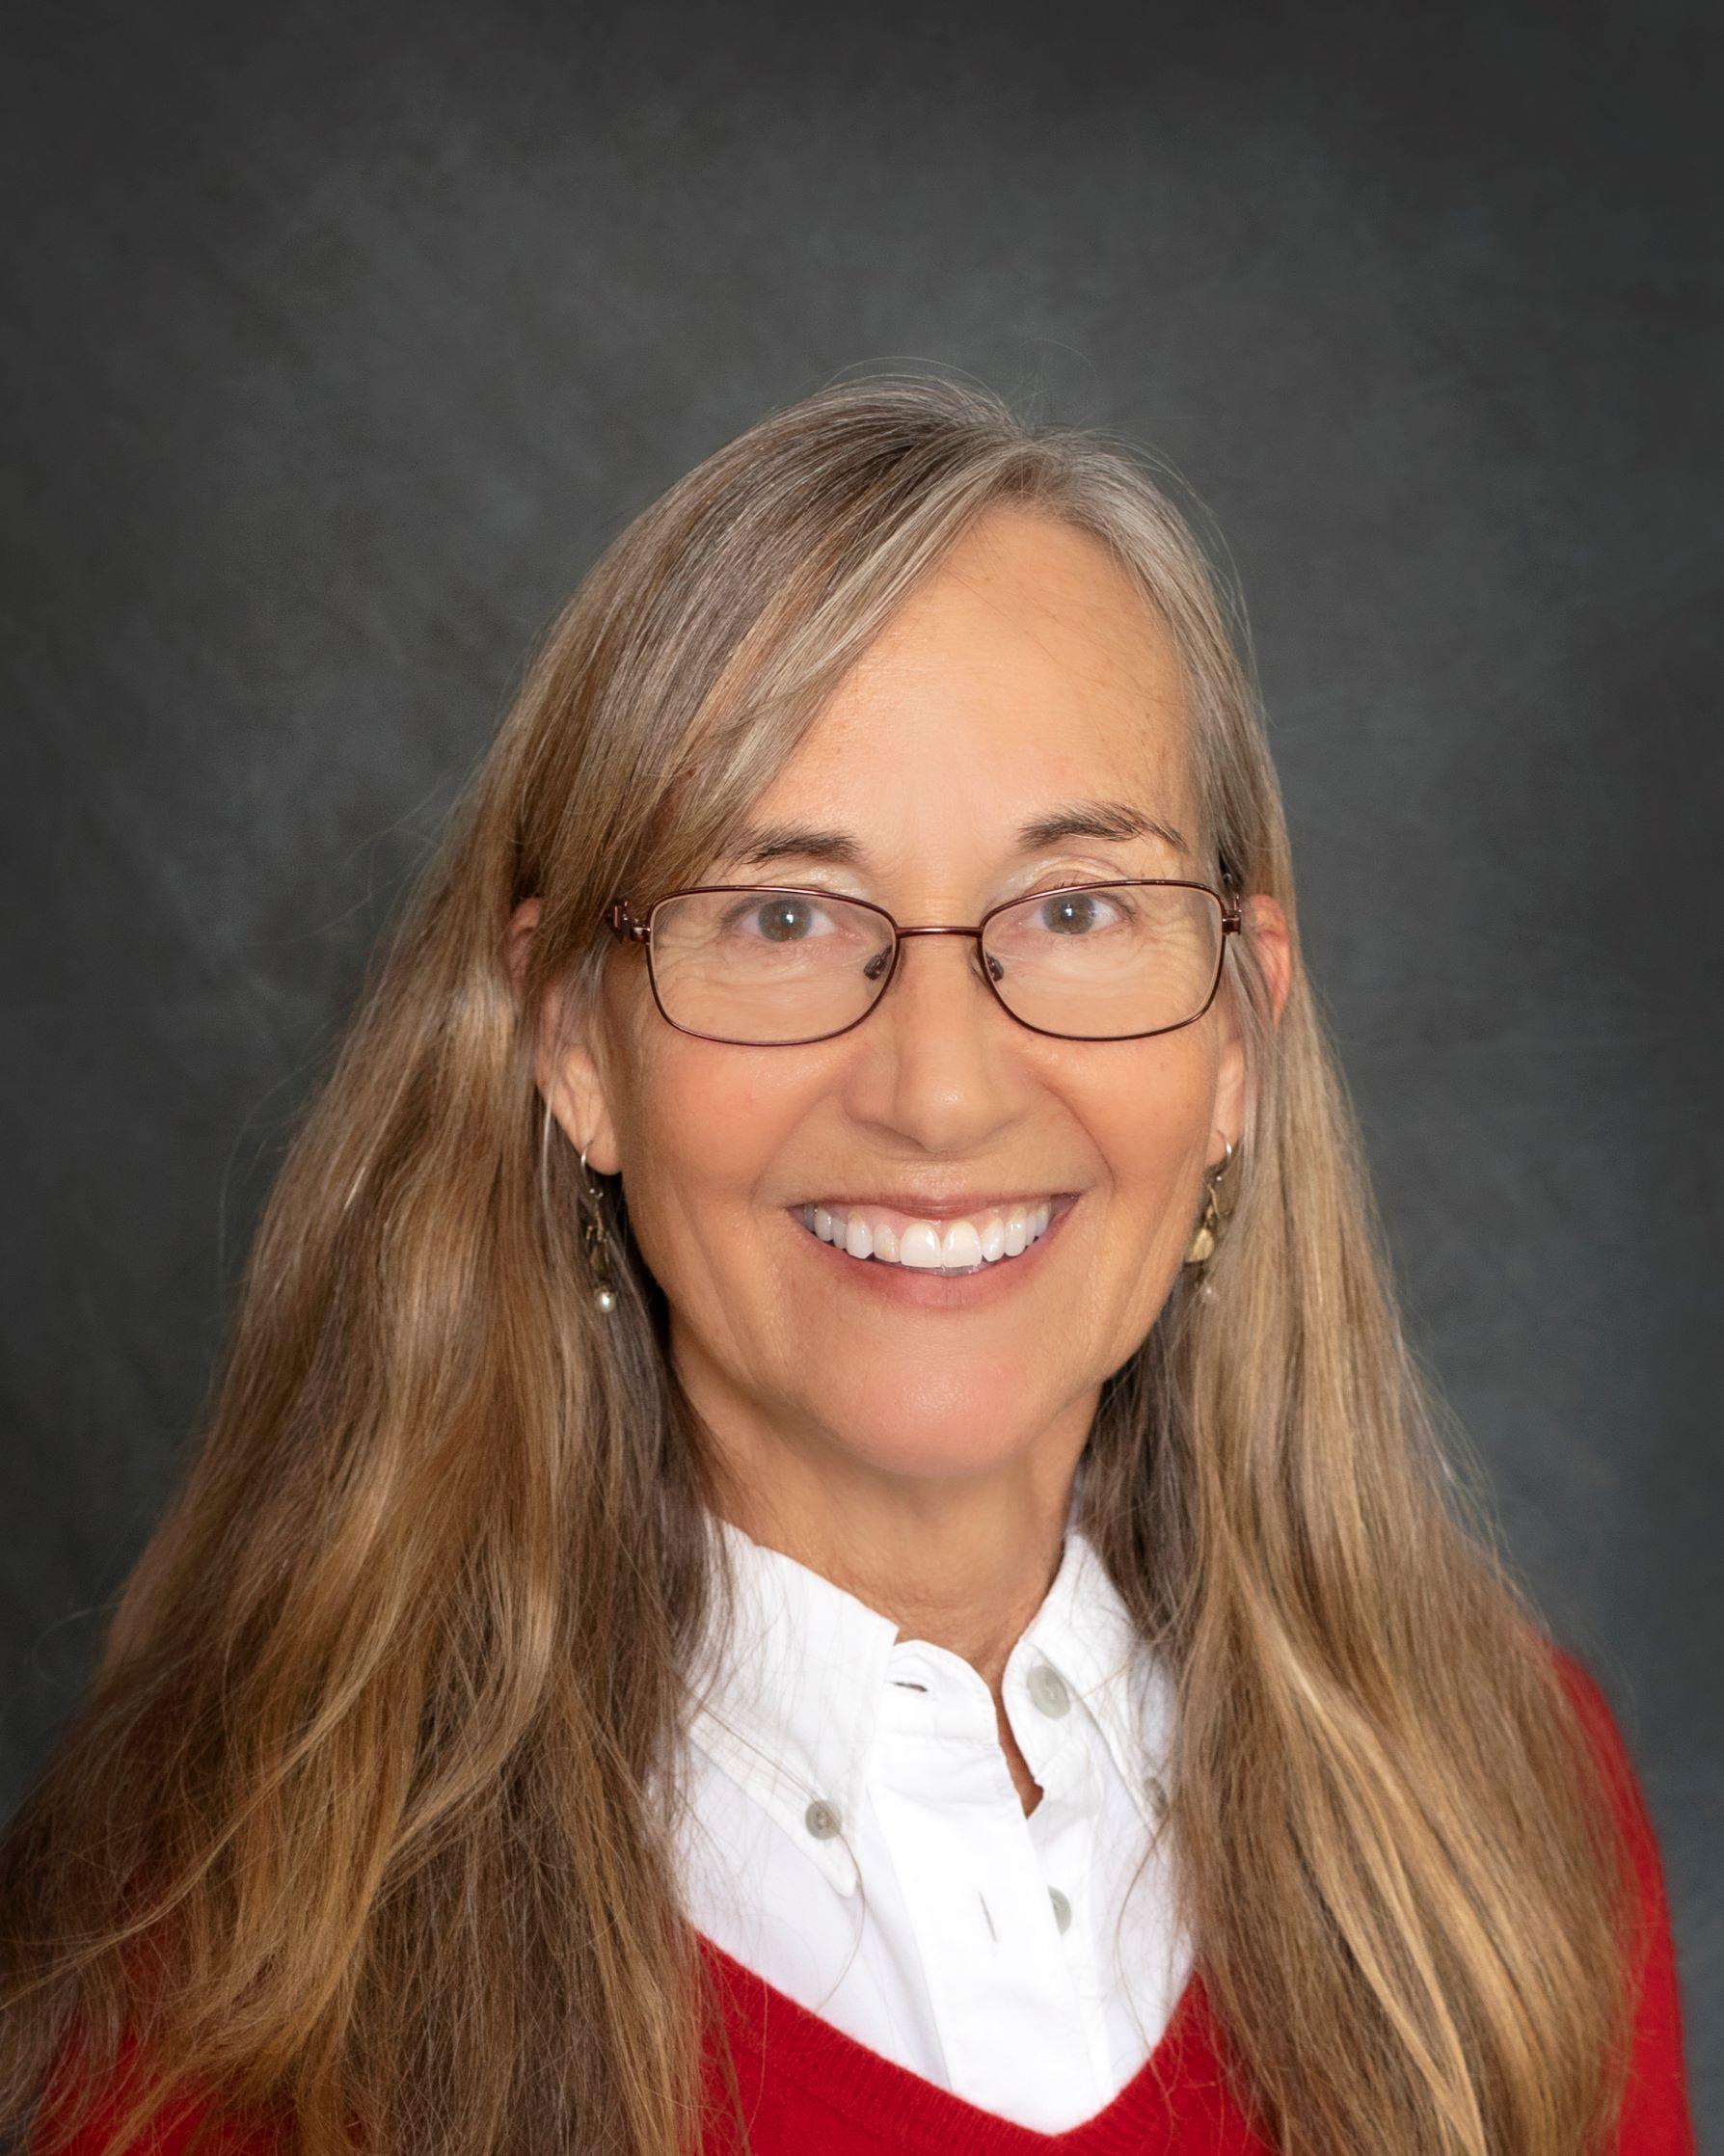 Celia Schahczenski, PhD